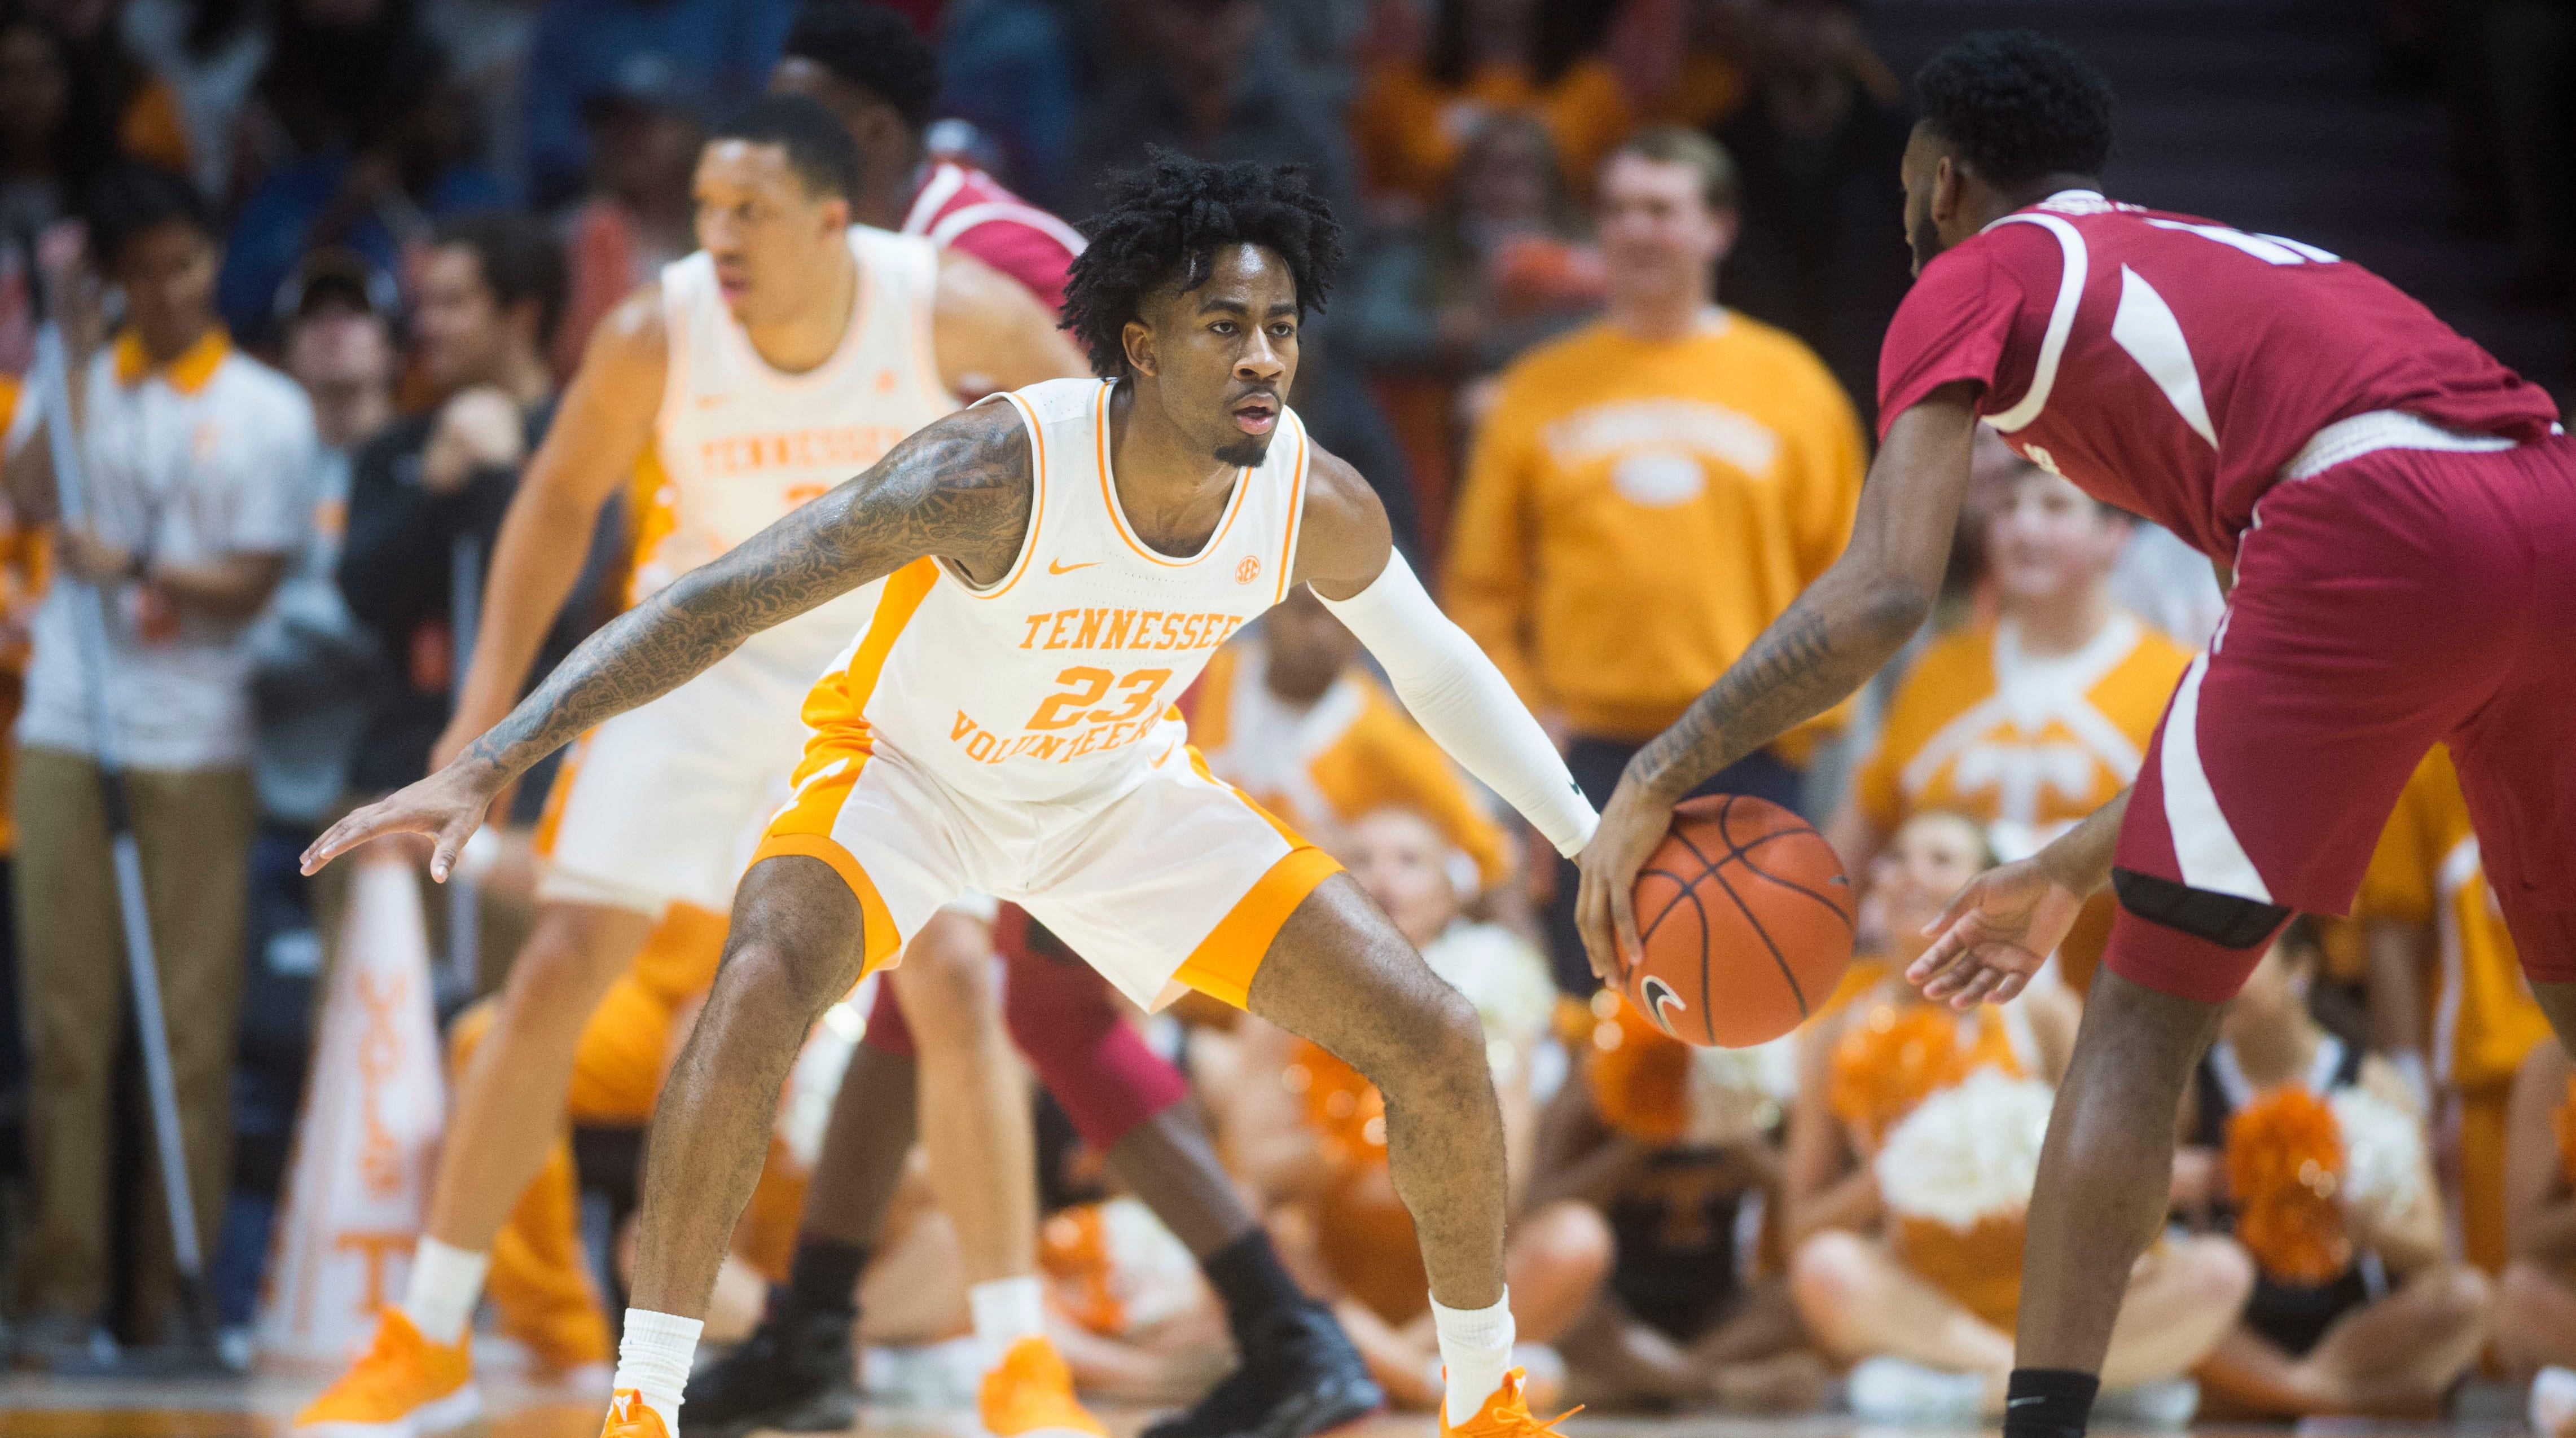 UT Vols basketball: Tennessee scores 106 points to beat Arkansas